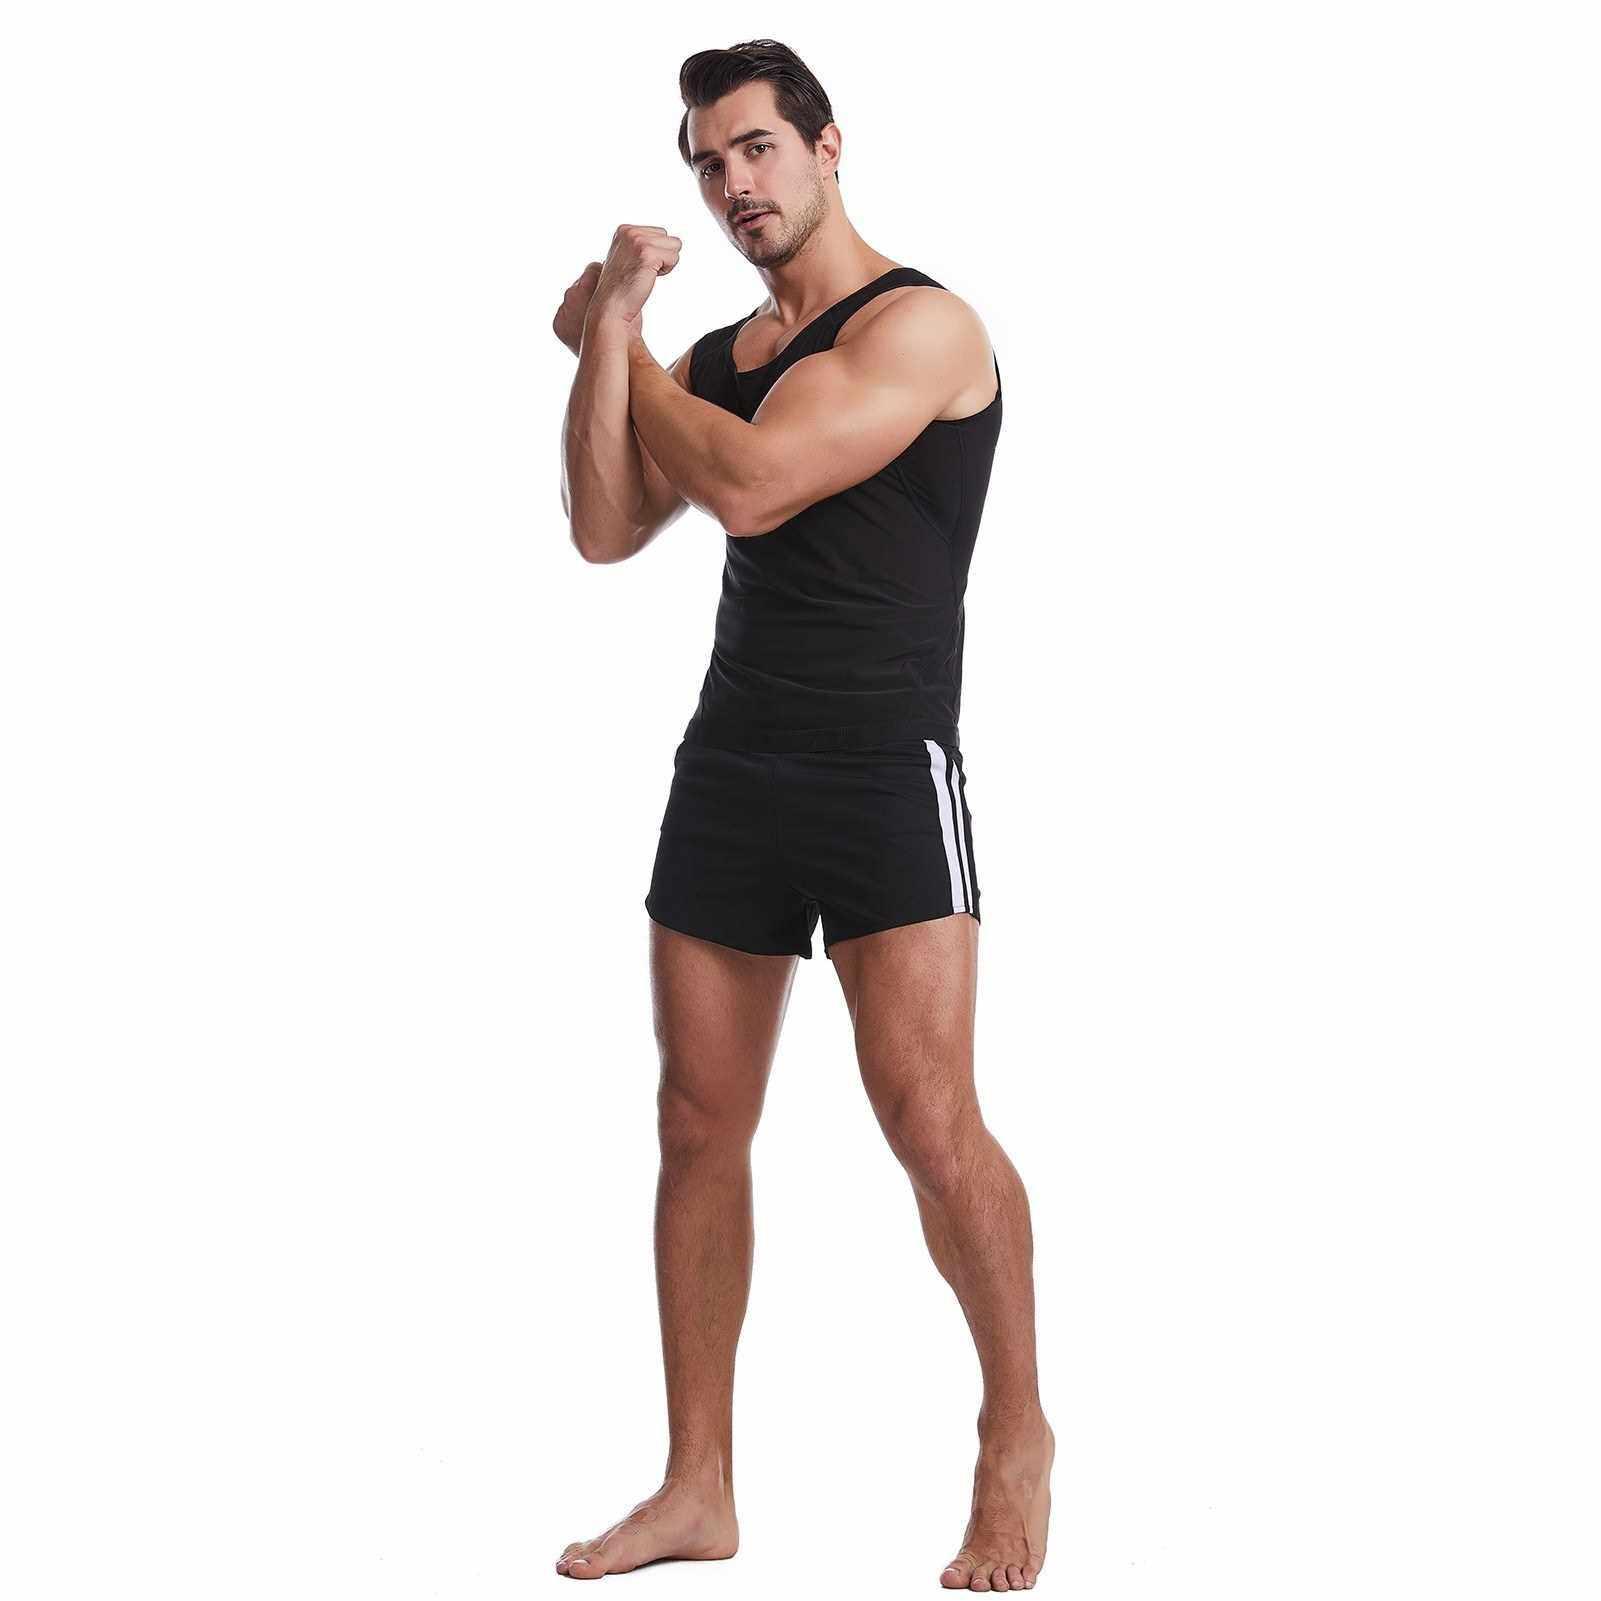 Men Sweat Sauna Shaper Vest Stretchable Bodycon Yoga Running Gym Compression Shapewear (Black)